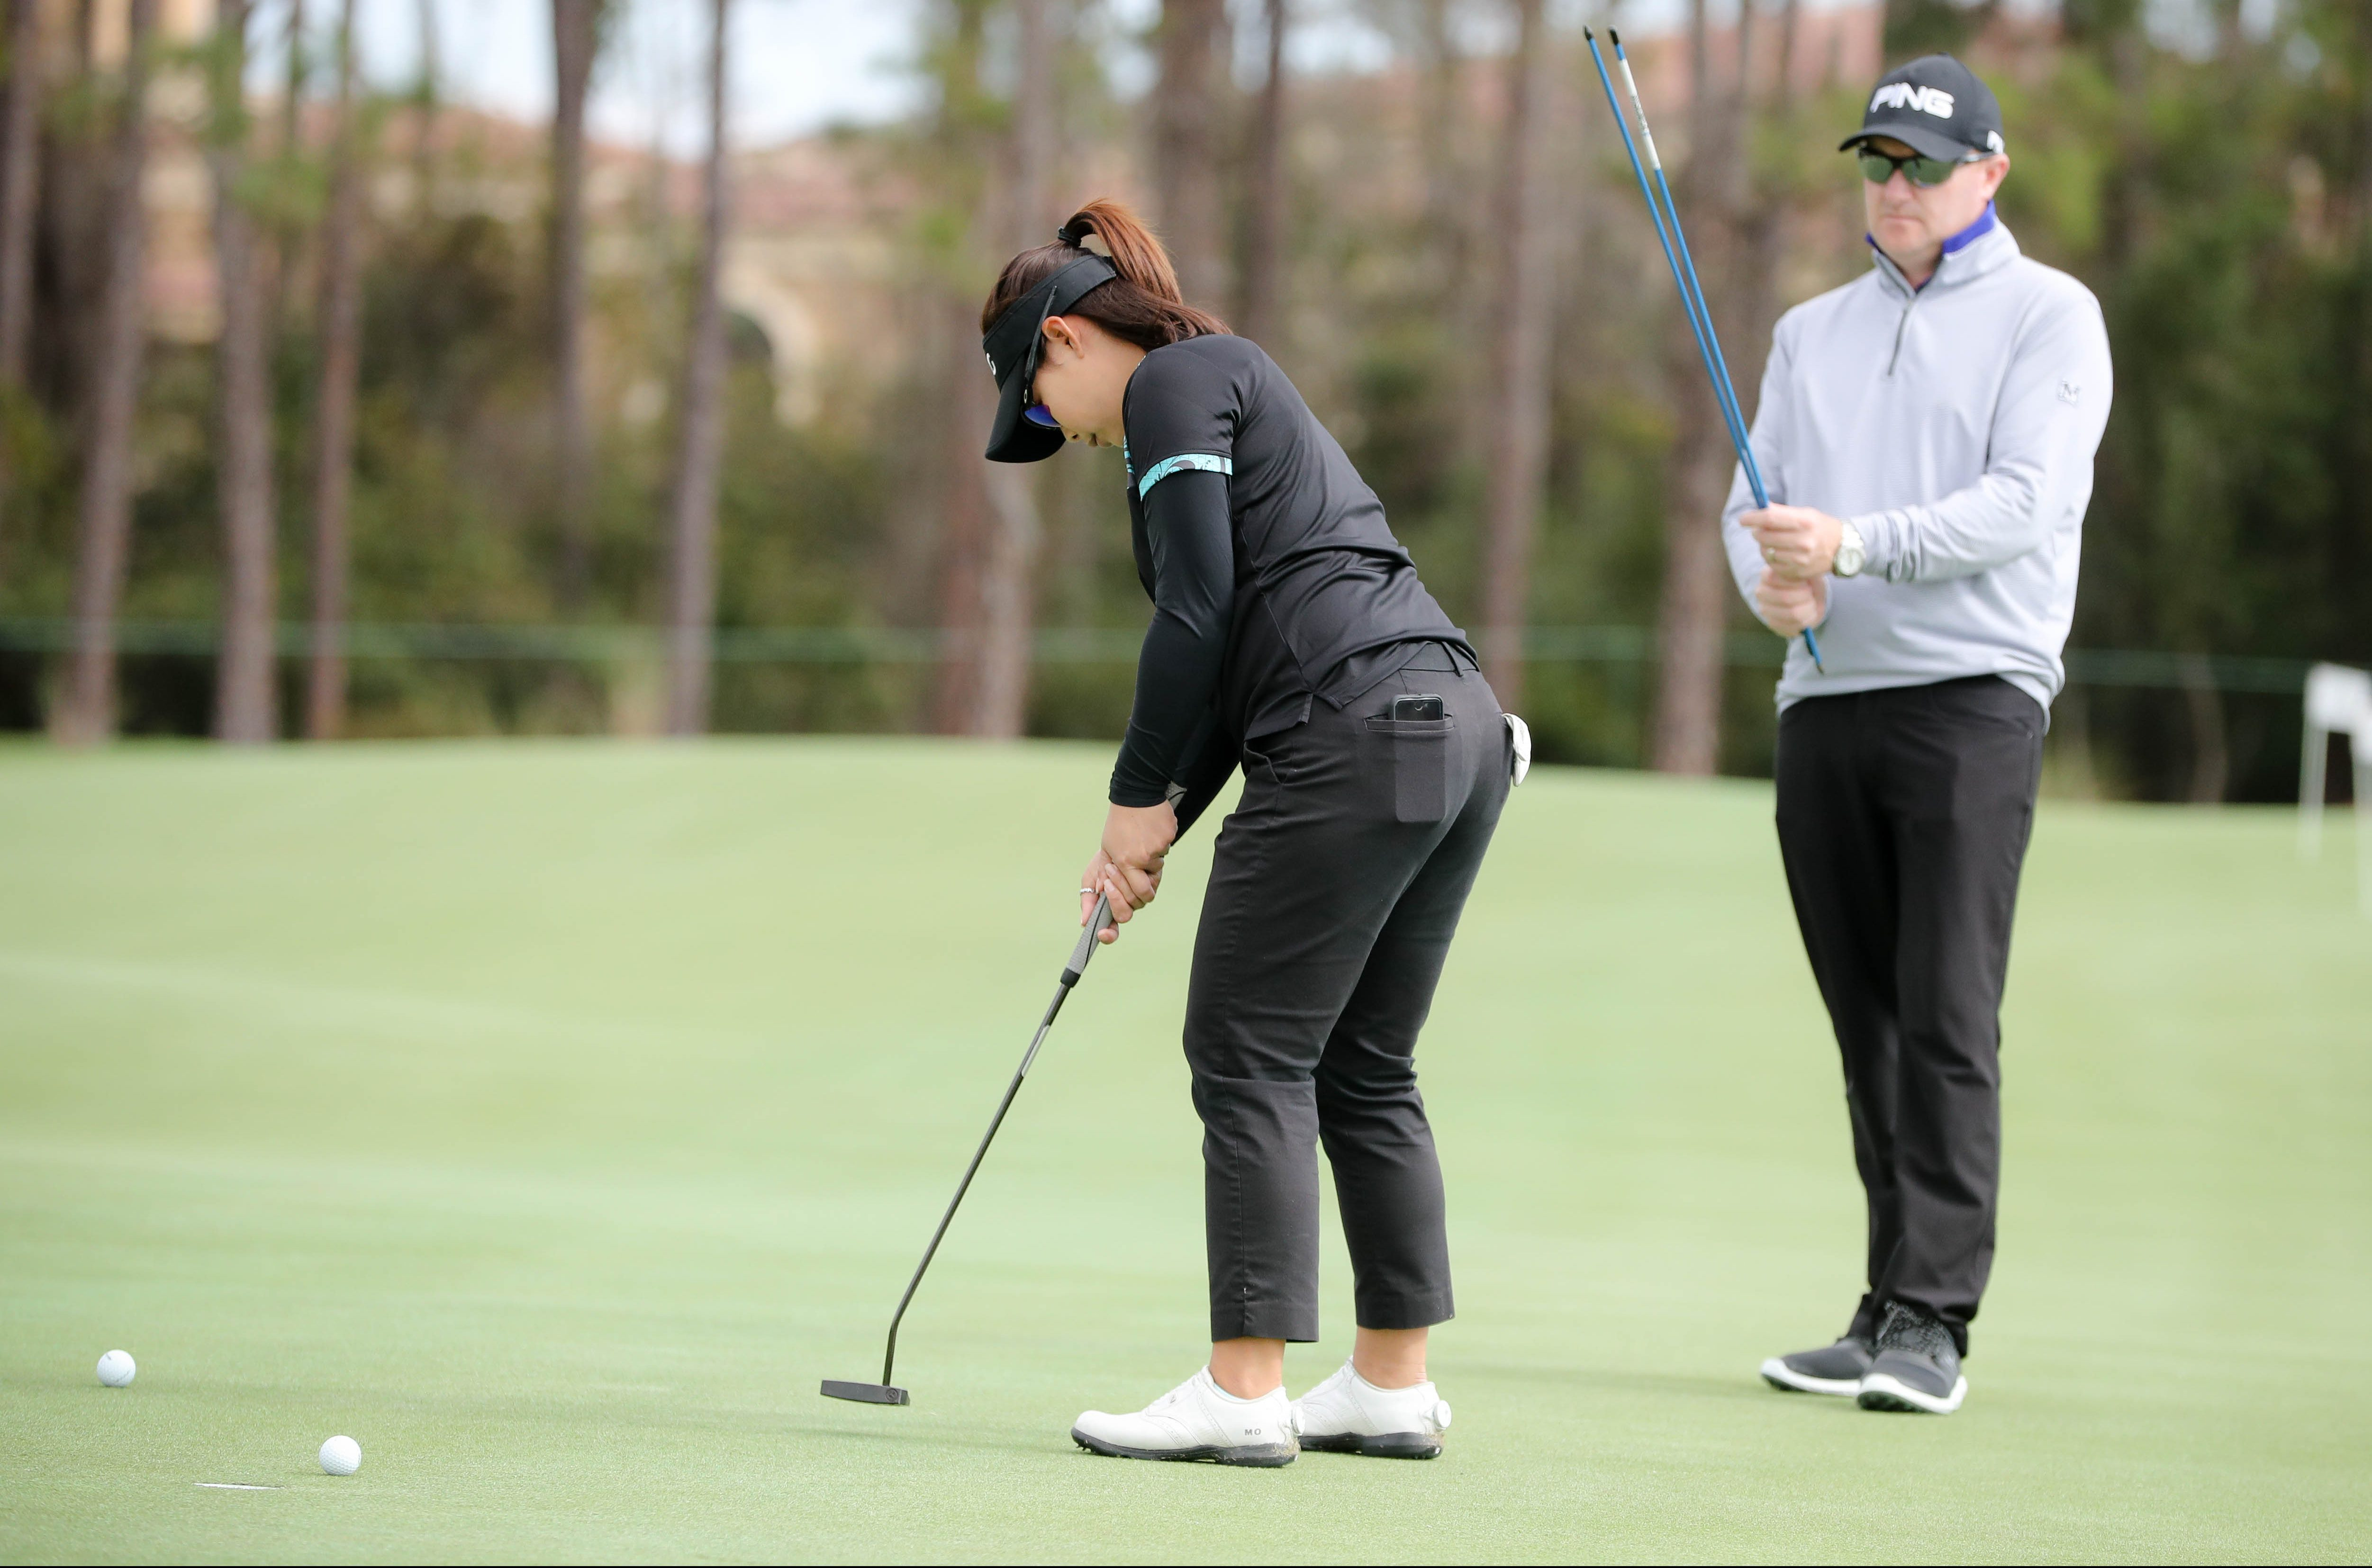 Jan 14, 2019;Lake Buena Vista, FL, USA; Putting coach Gareth Raflewski and LPGA players Ariya and Moriya Jutanugarn during the LPGA Diamond Resorts TOC at Tranquilo GC at Four Seasons.